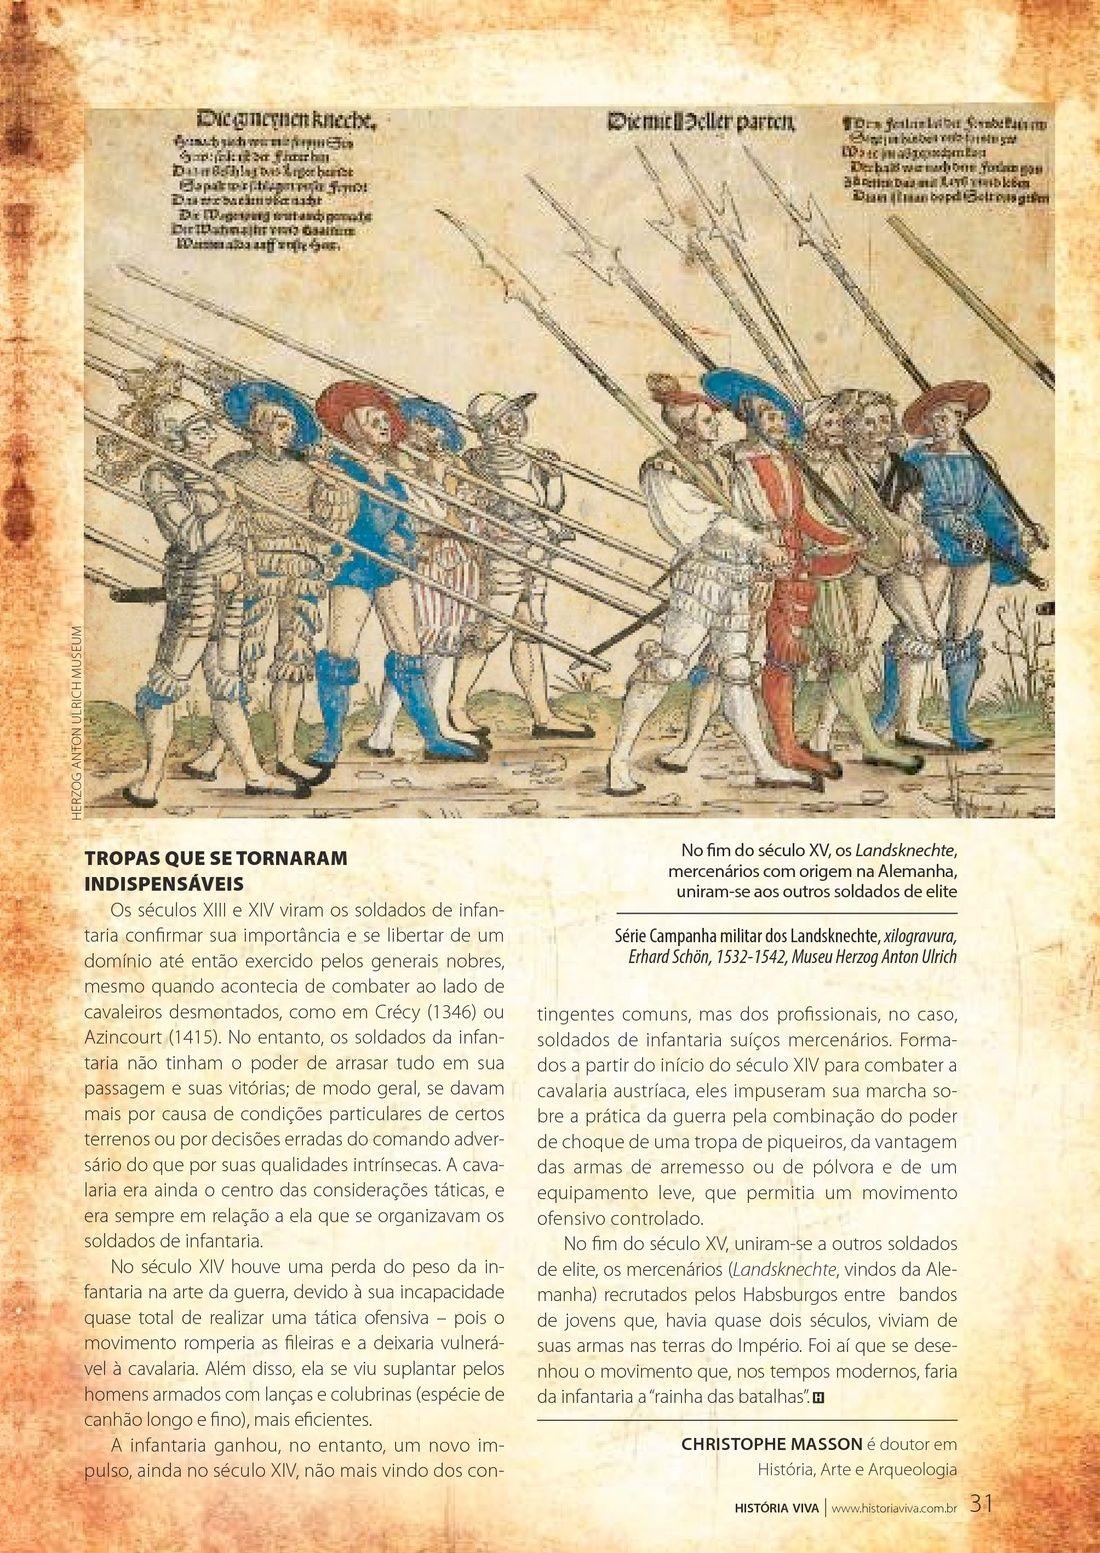 Nuvem do Jornaleiro - História Viva